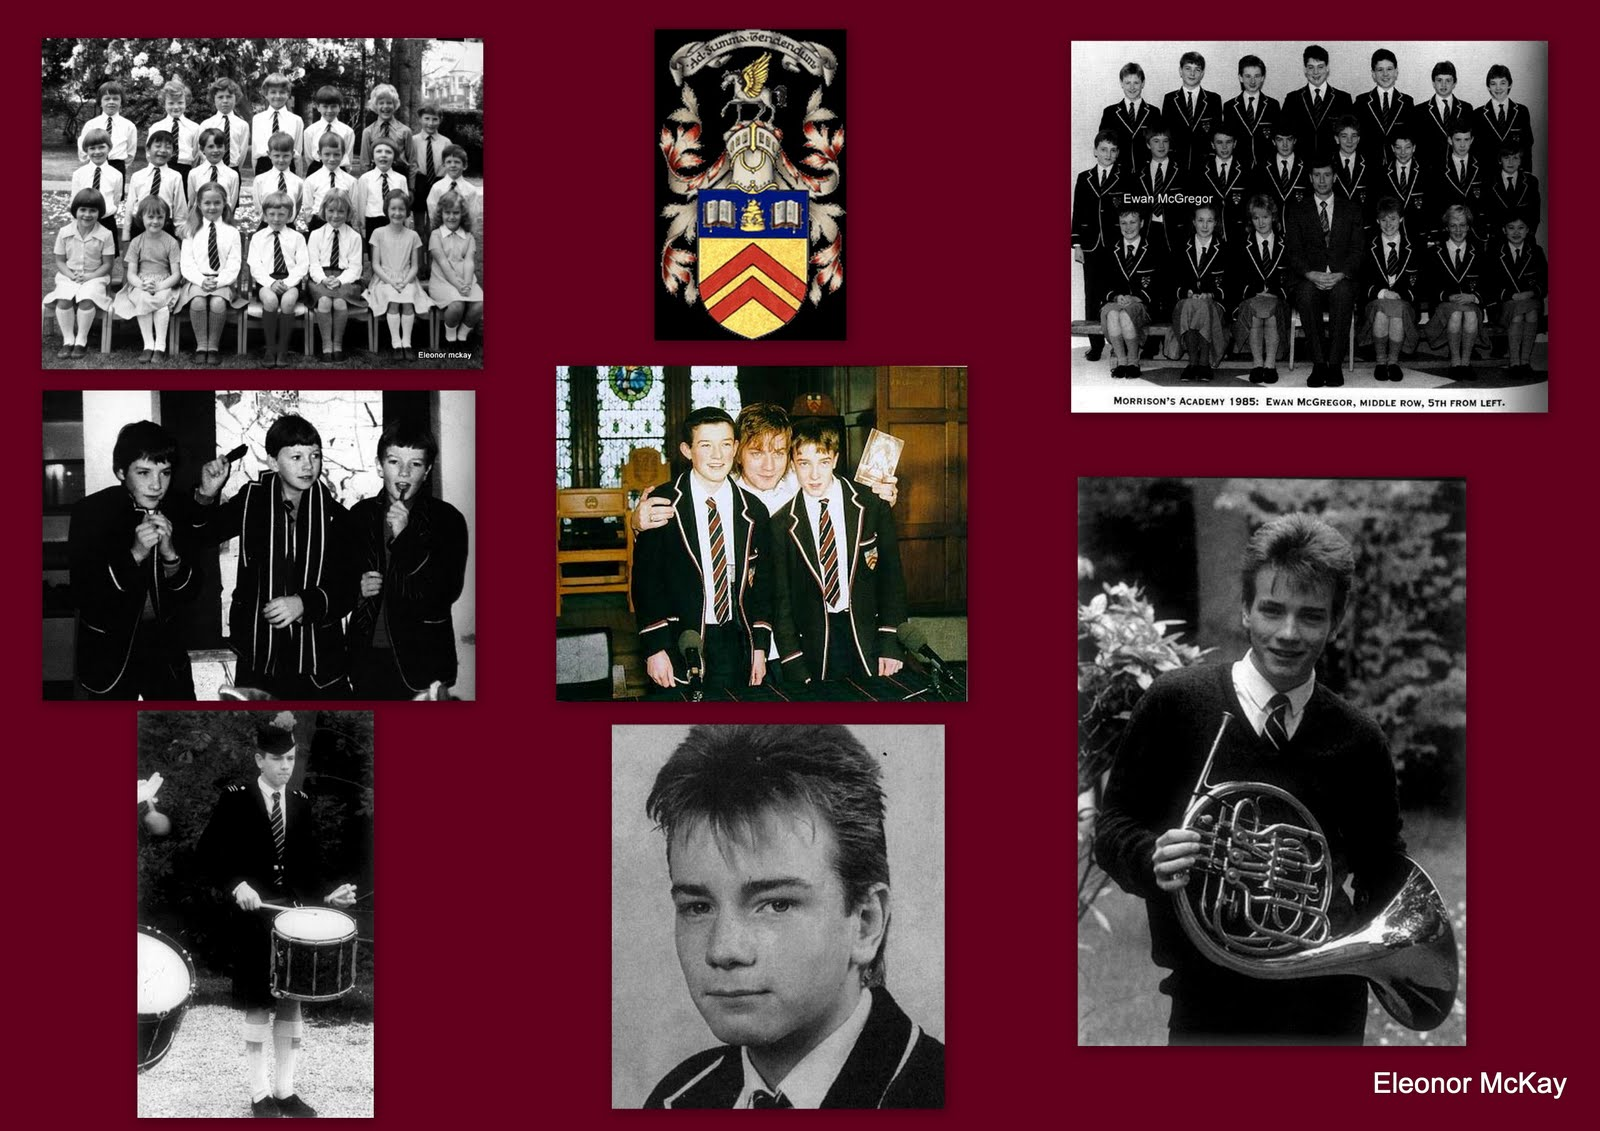 http://4.bp.blogspot.com/_Dcdjd7cgaKo/TIkL4bwXfqI/AAAAAAAAP2s/zqRdf1iDo4Q/s1600/morrison%27s+academy-1.jpg